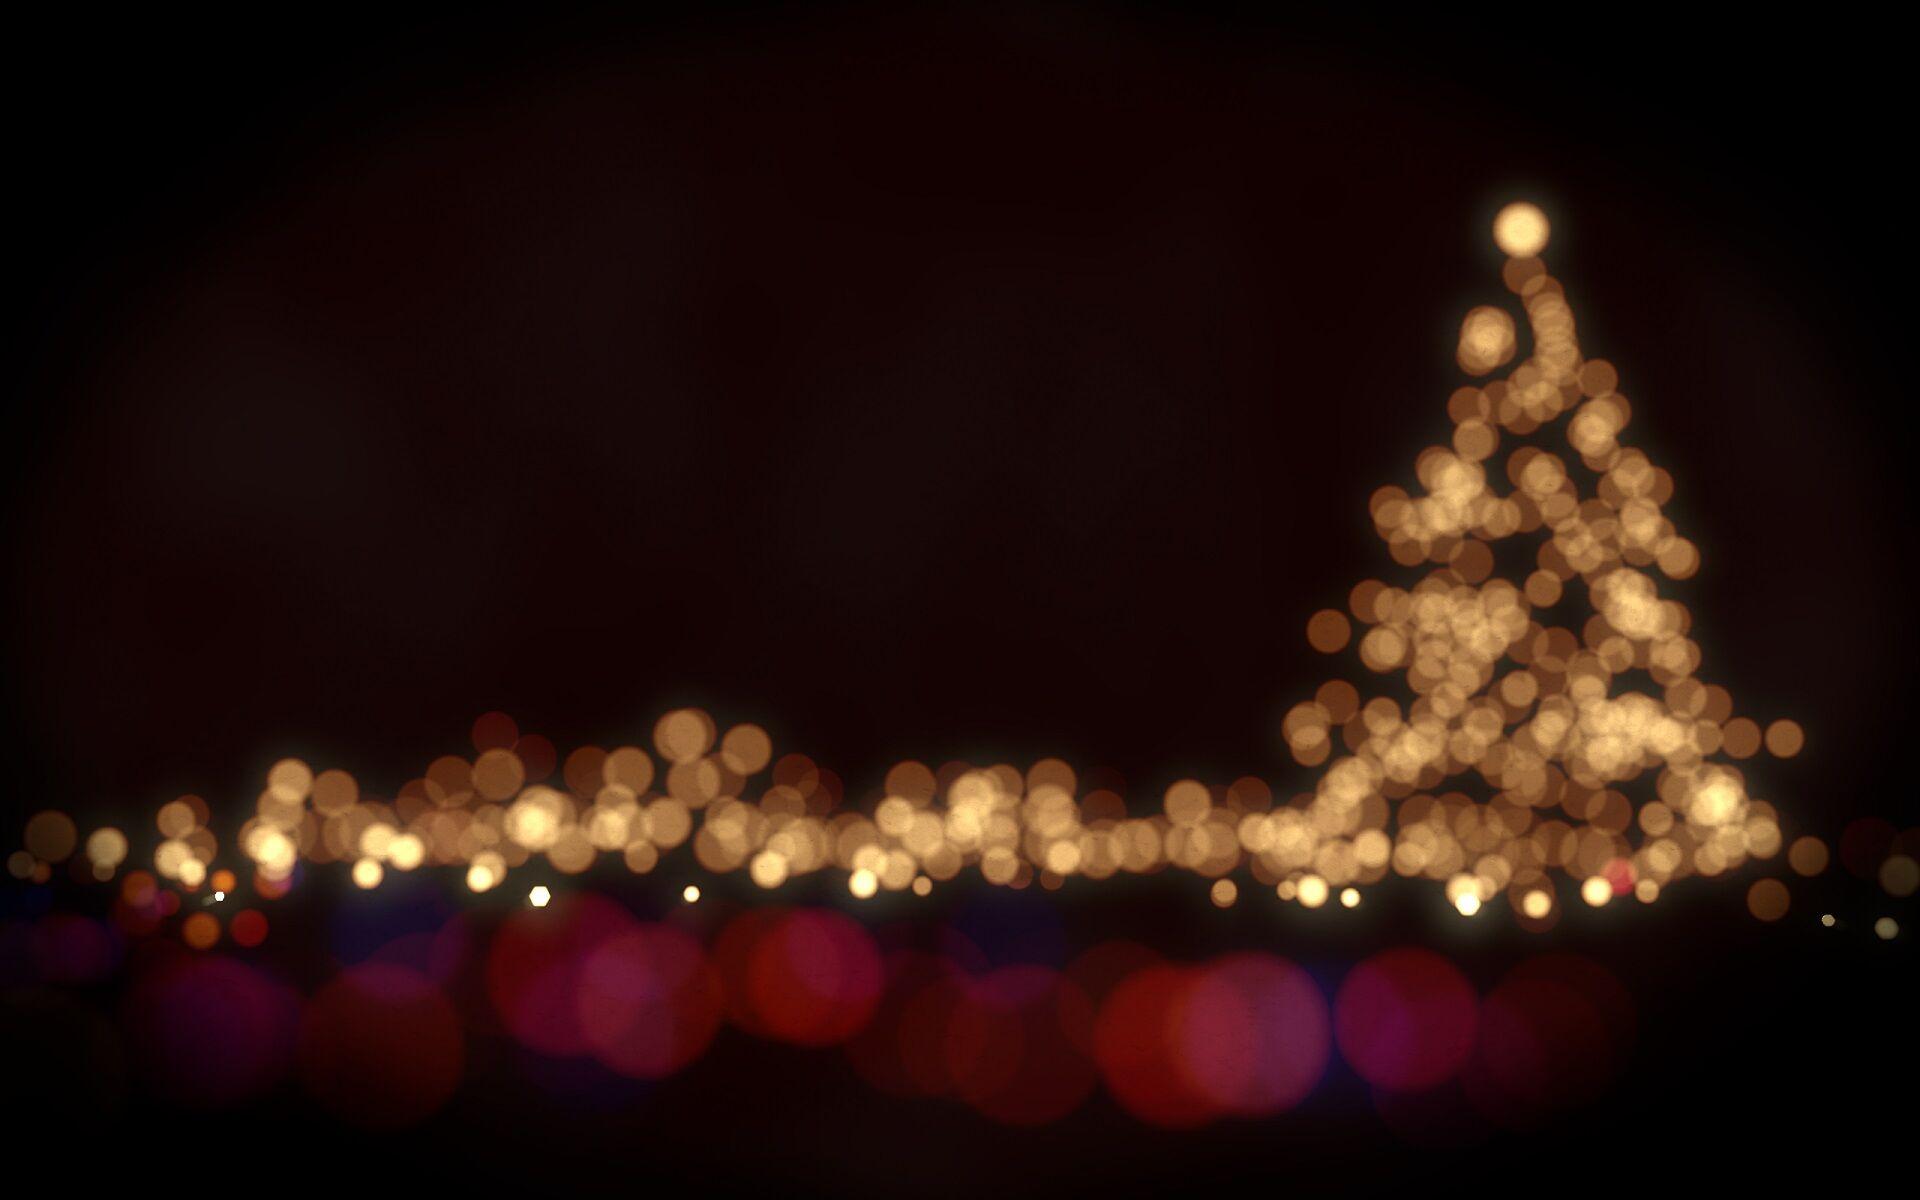 Kumpulan Wallpaper HD Paling Keren Hari Natal 2015